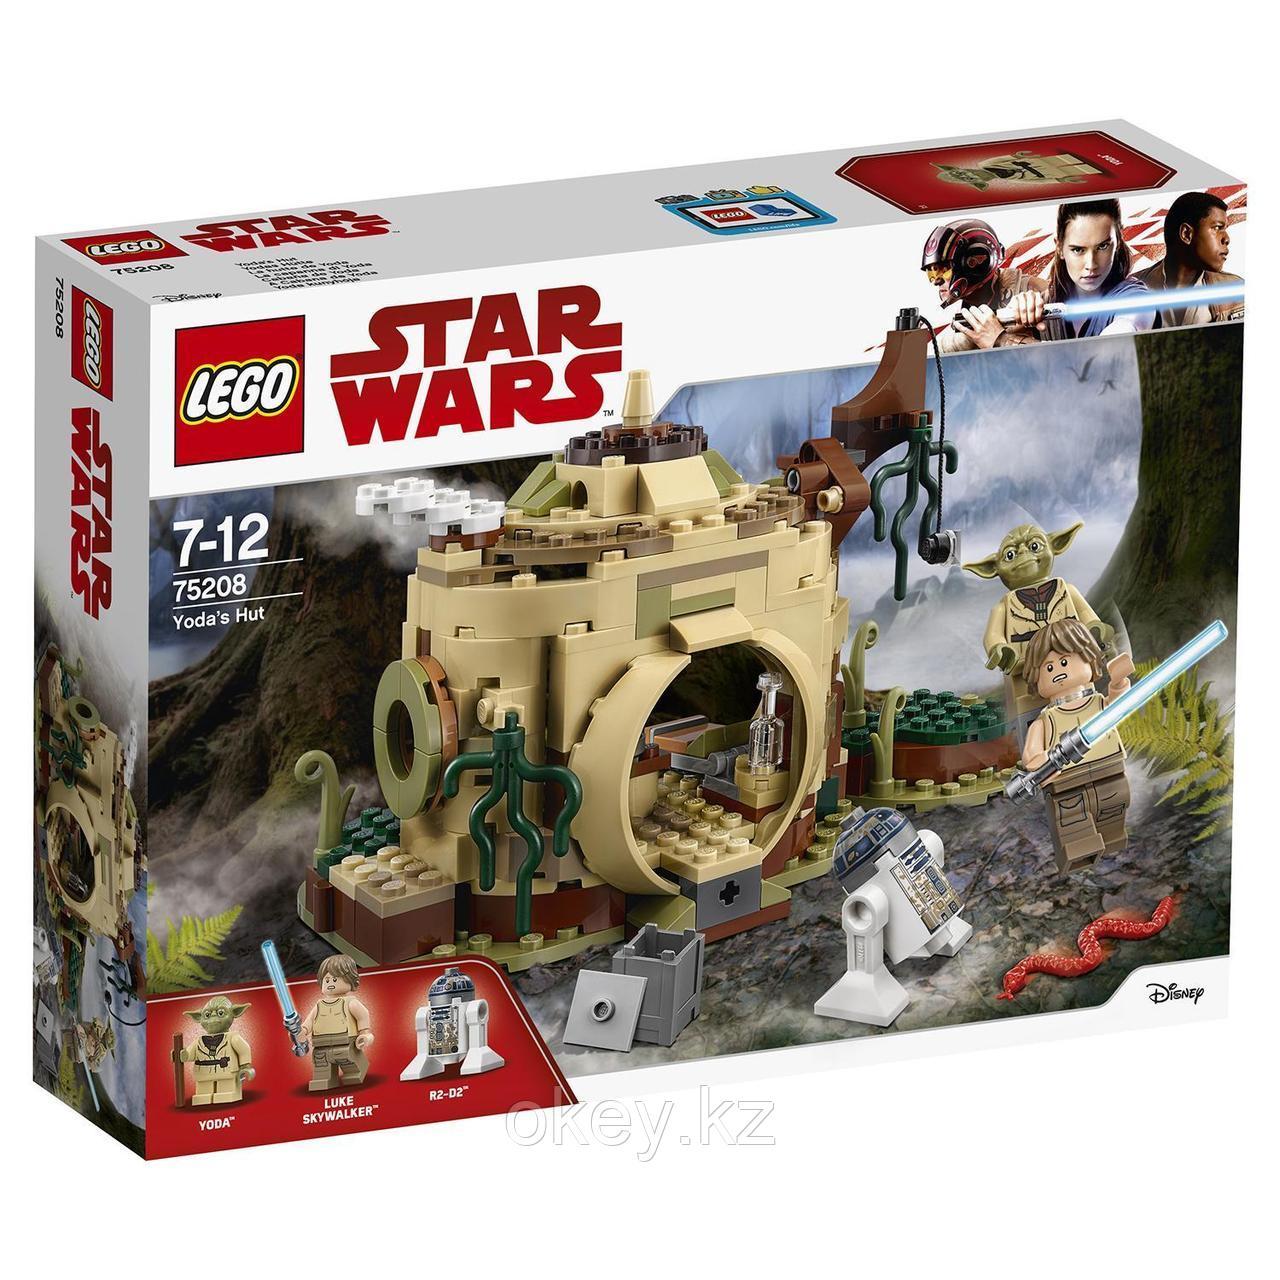 LEGO Star Wars: Хижина Йоды 75208